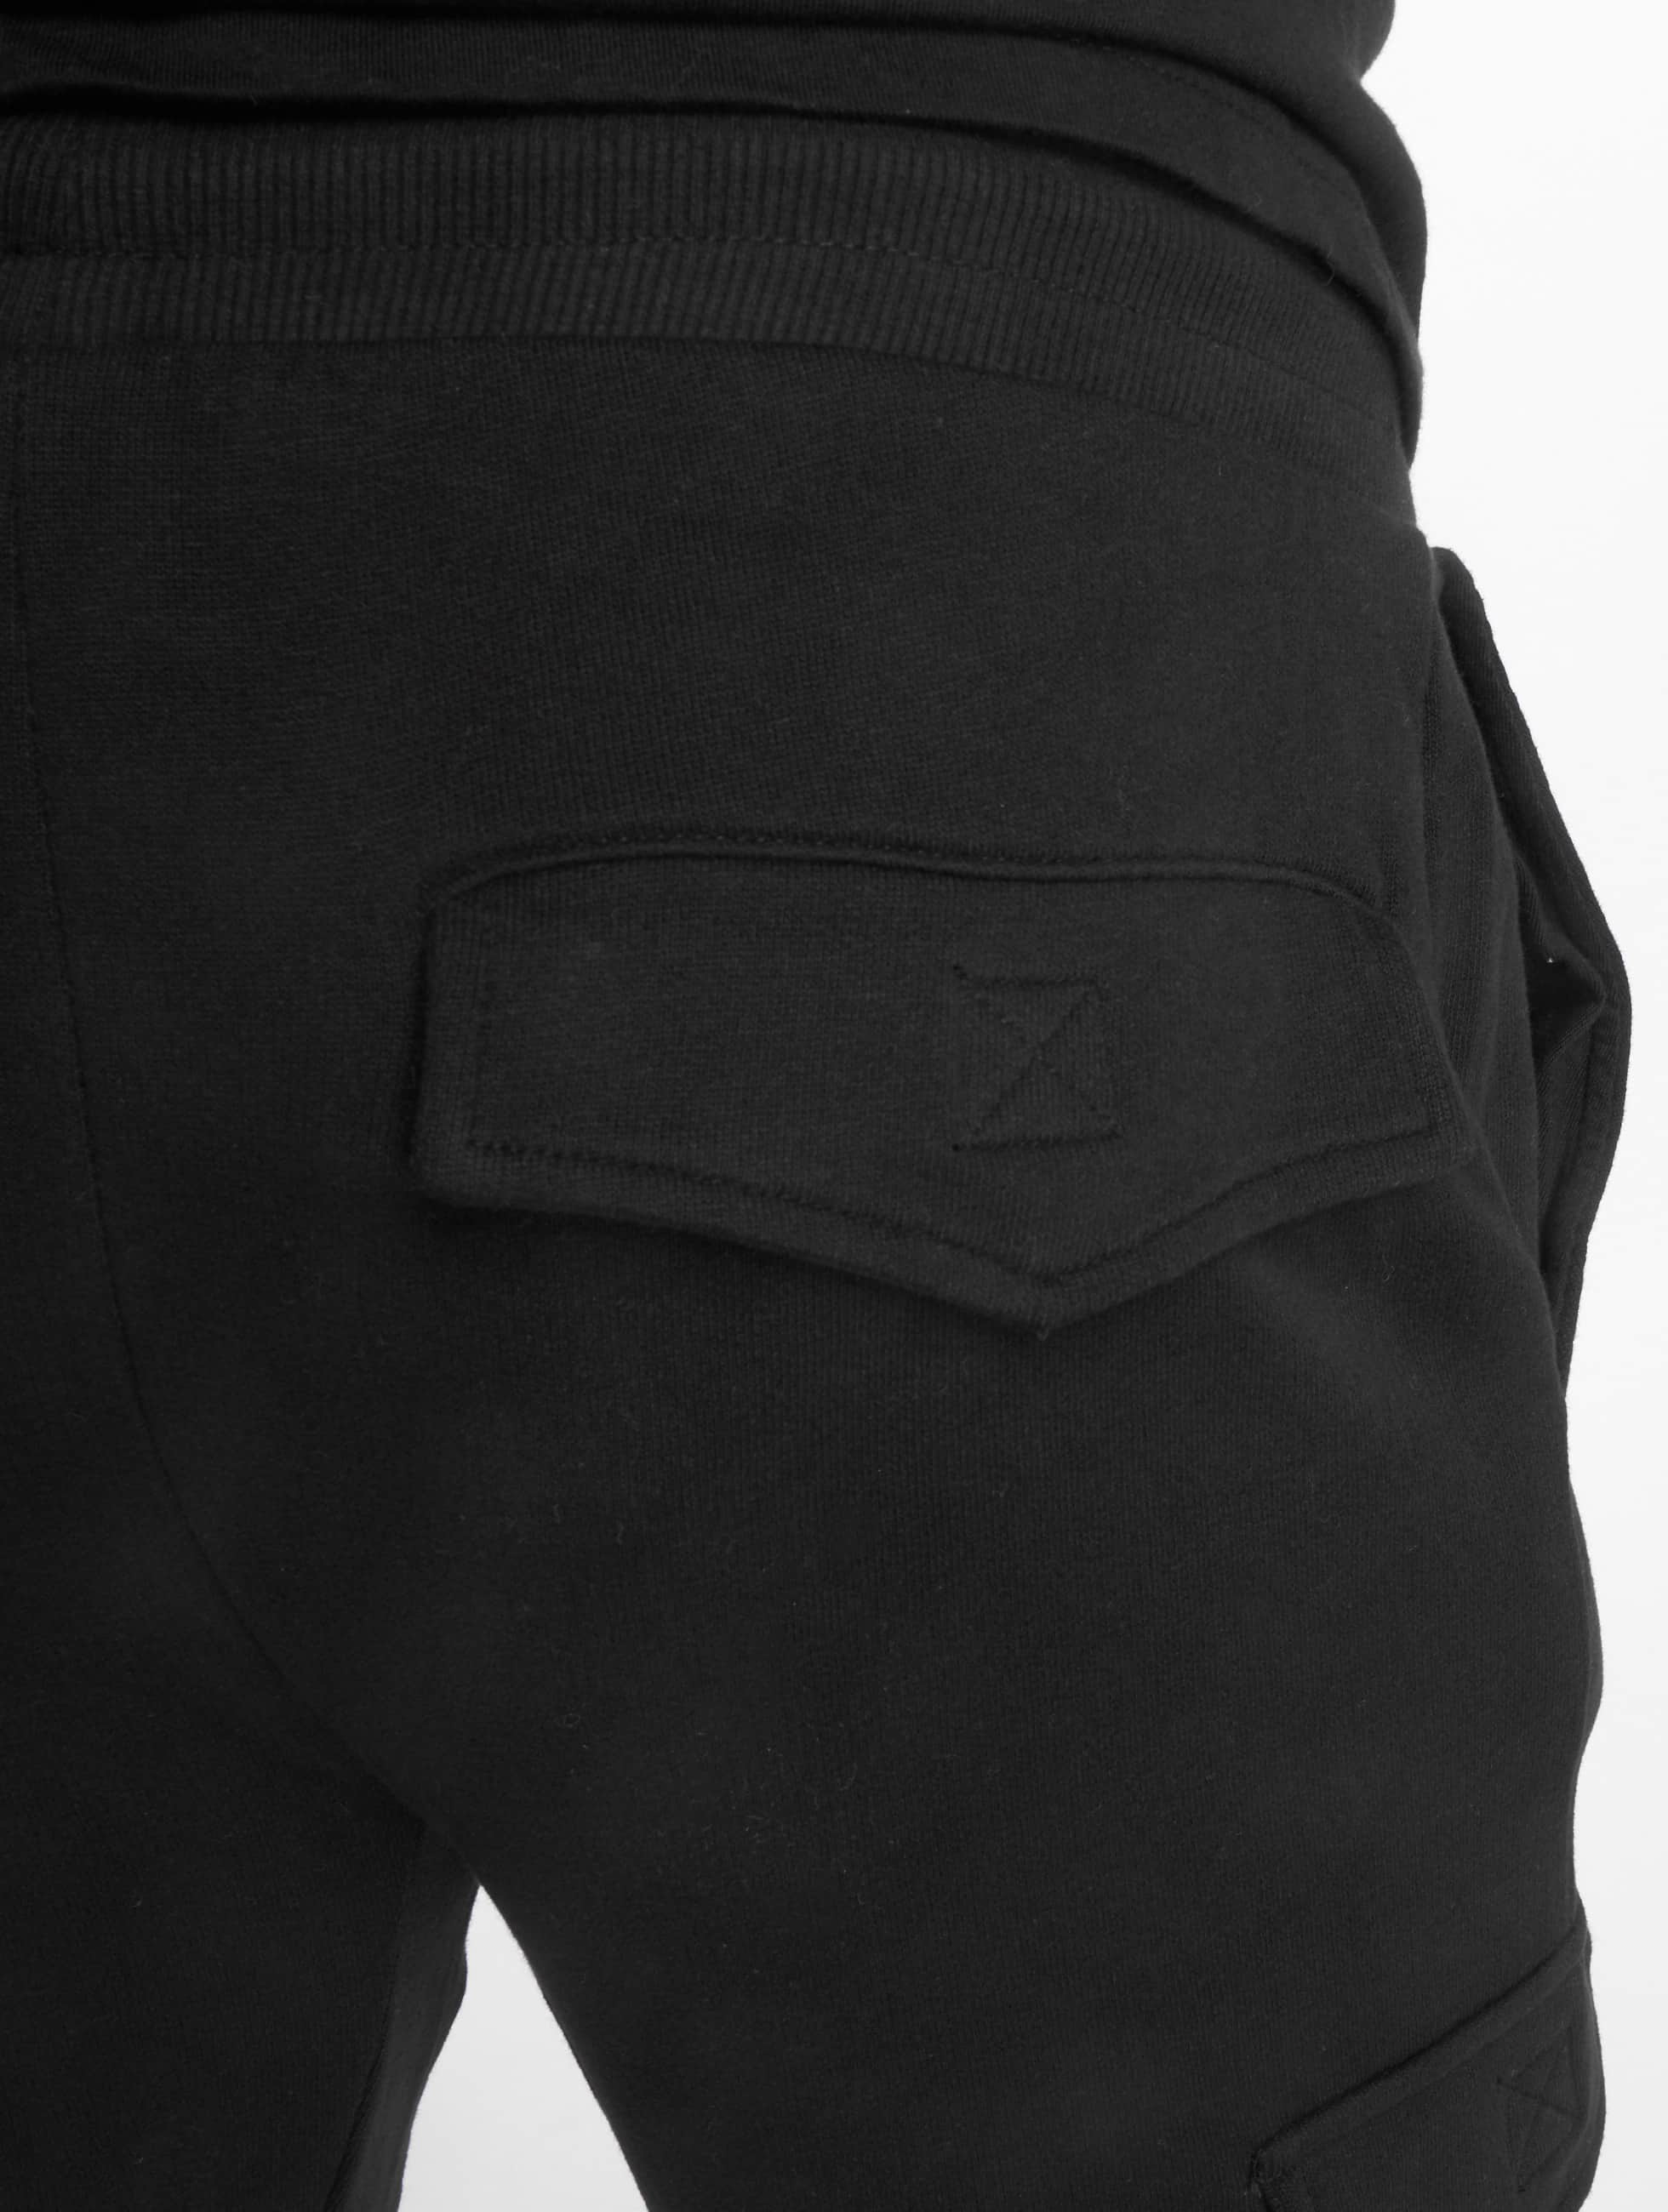 Urban Classics joggingbroek Fitted Cargo zwart